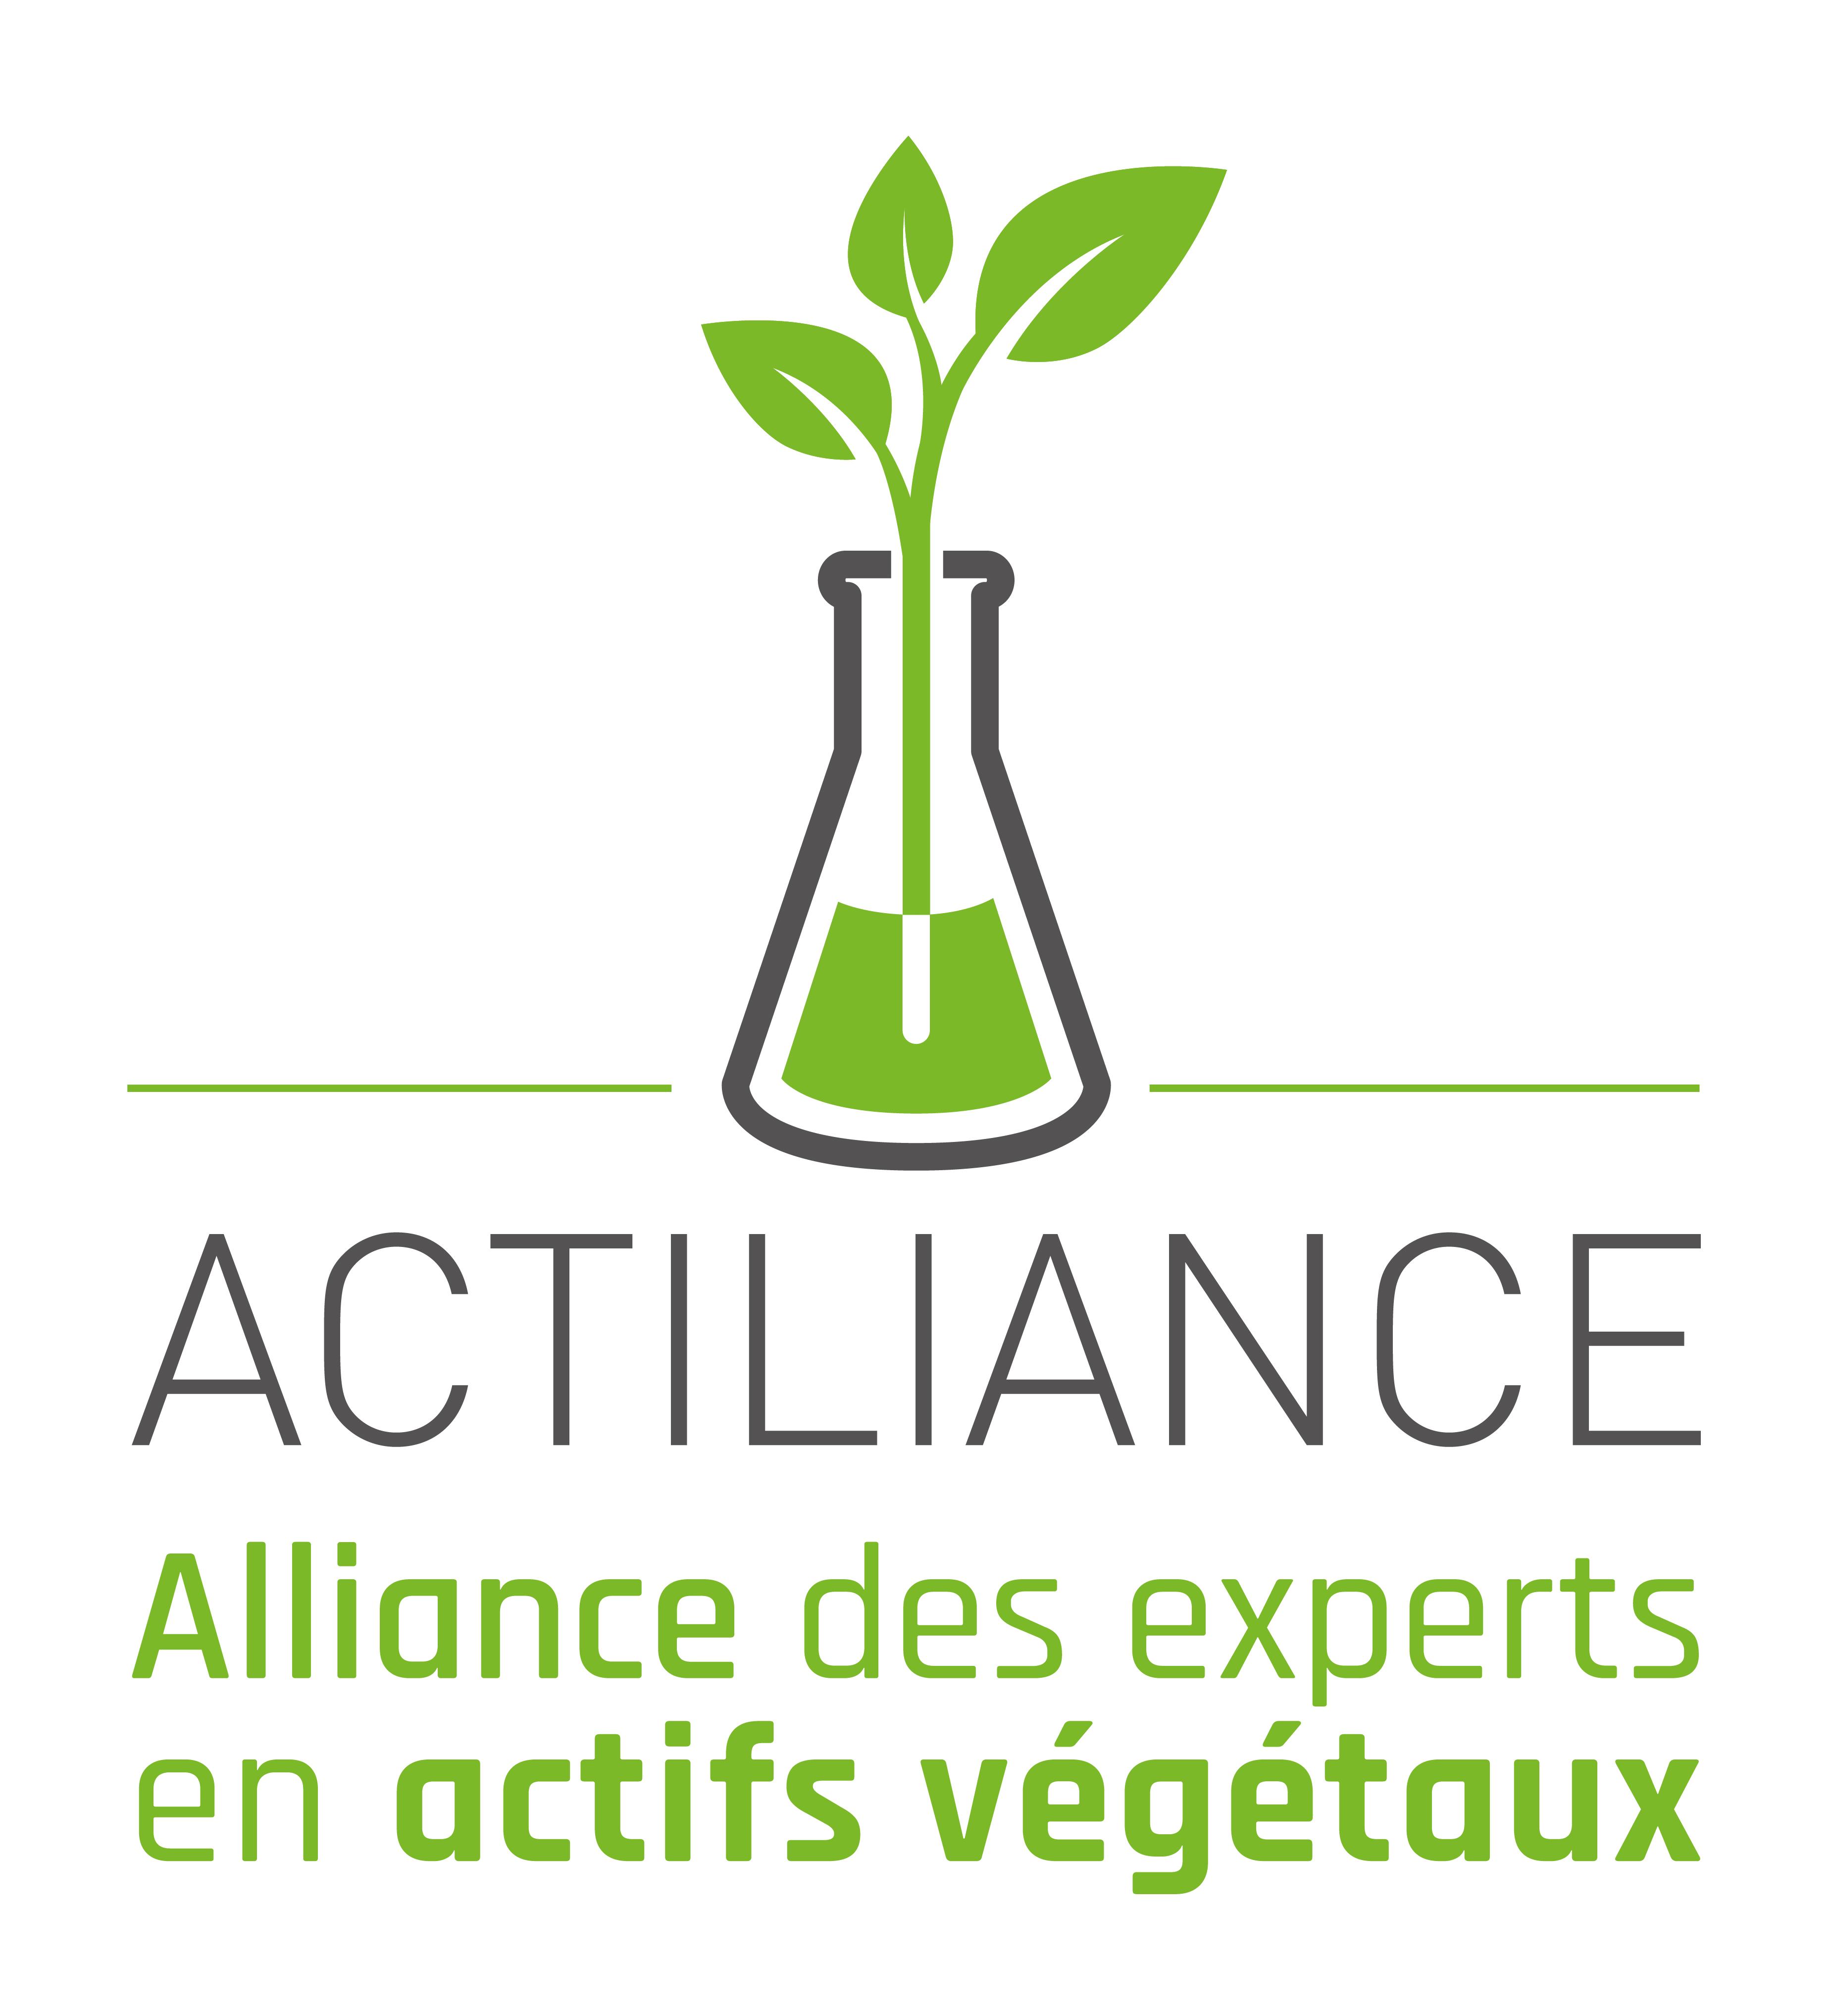 actiliance-logo-hd_rvb